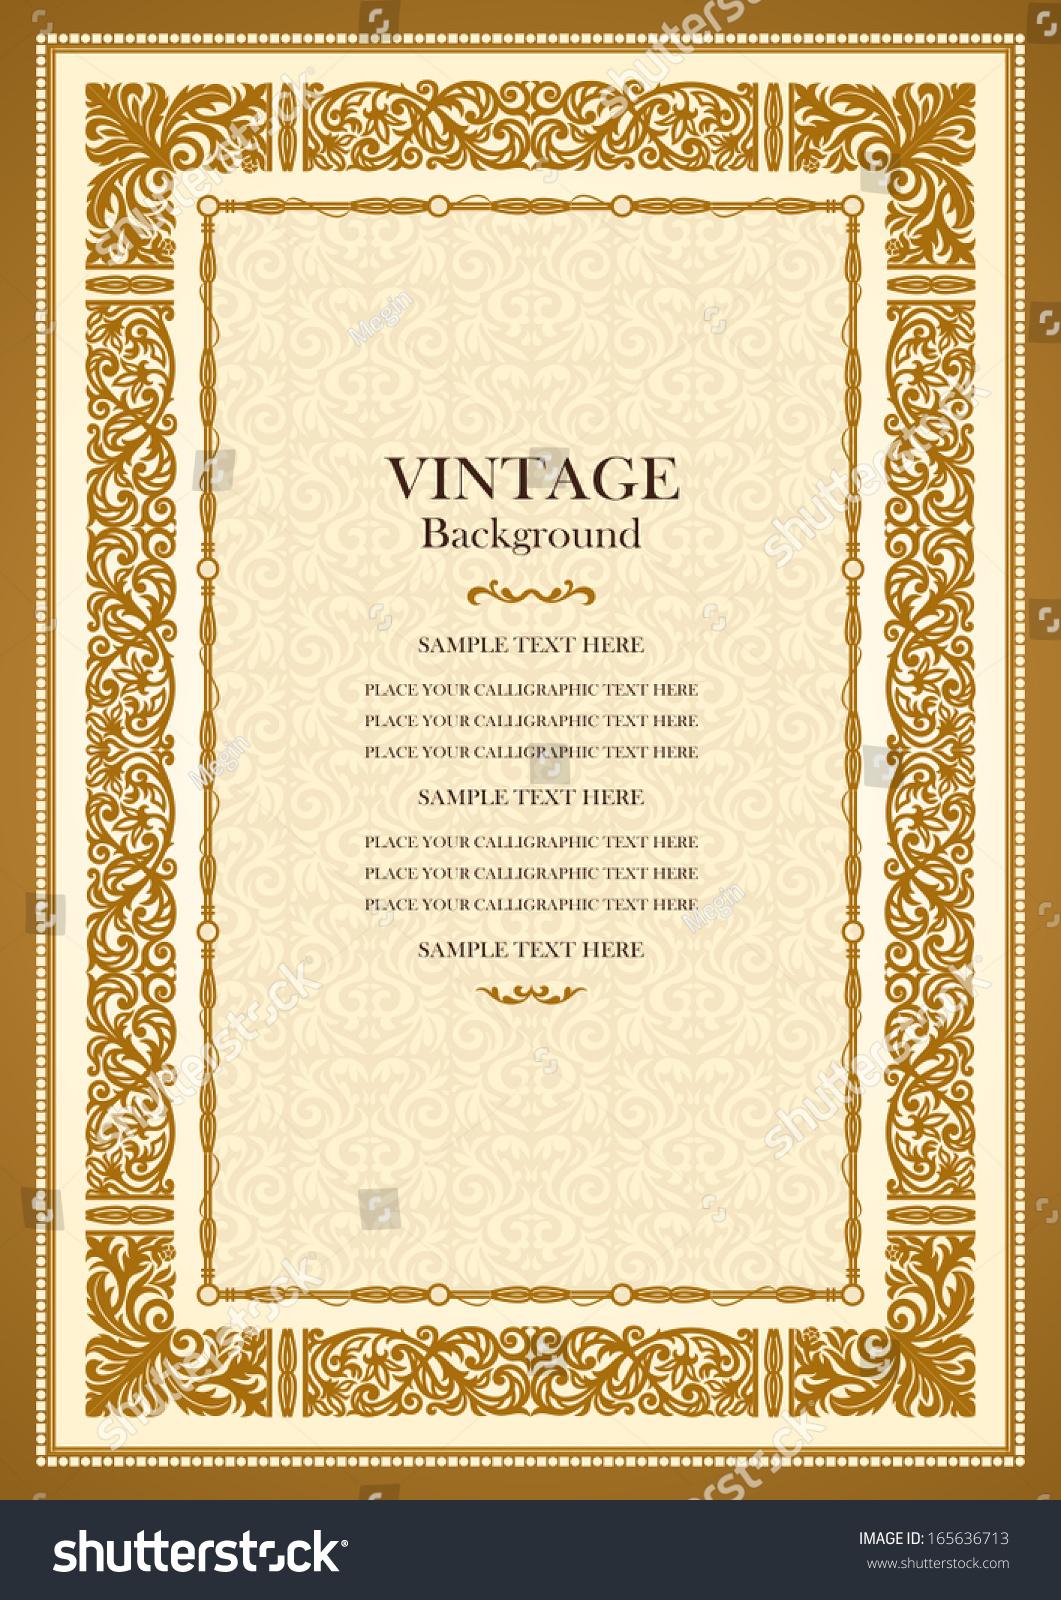 Vintage Gold Background Antique Style Frame Stock Vector ...